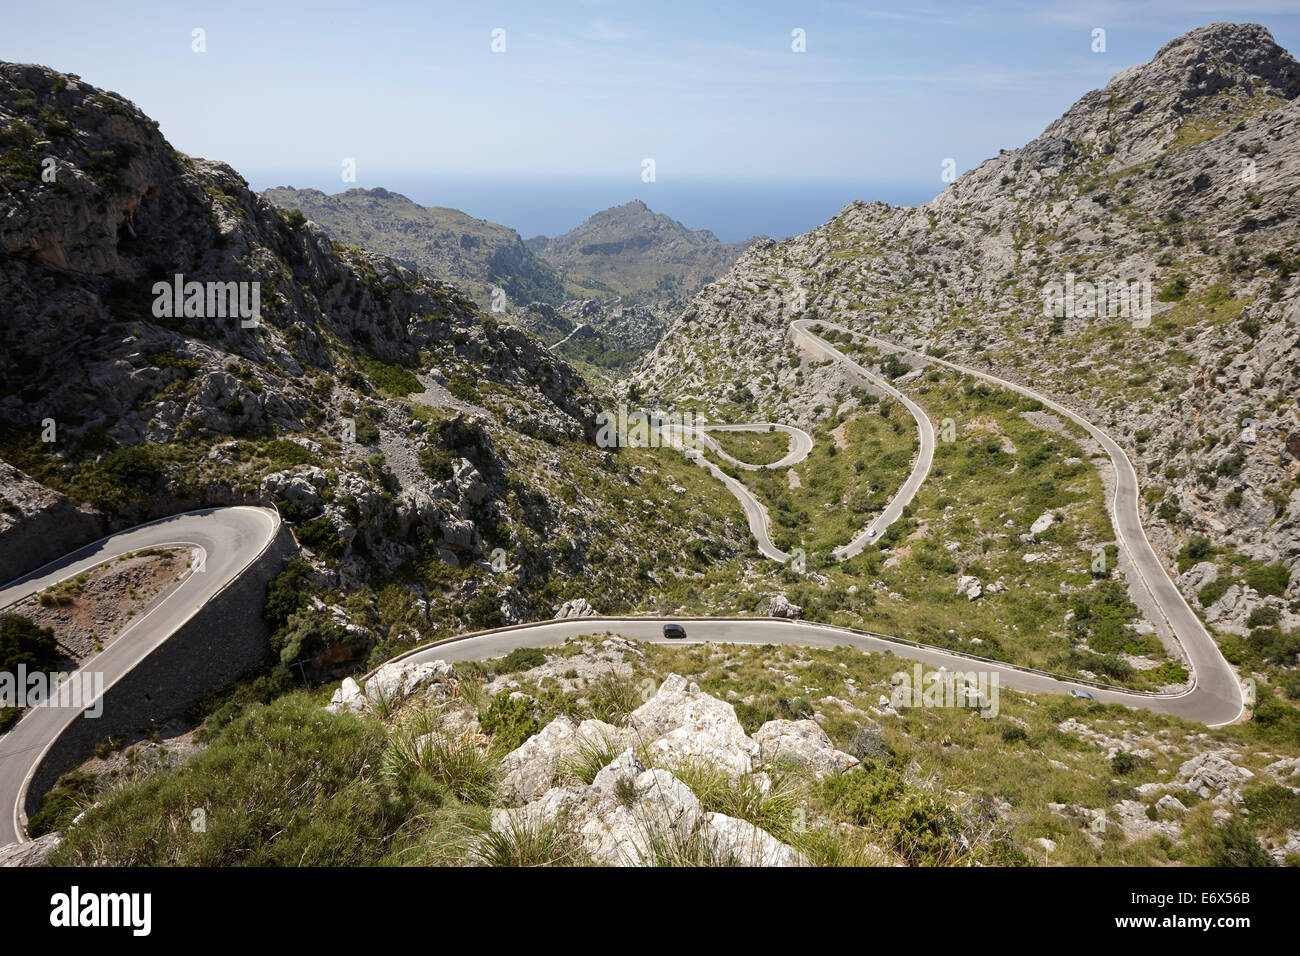 "Legendären Road ""The Snake"", Sa Calobra, MA-2141, Tramuntana Gebirge, Mallorca, Balearen, Spanien Stockbild"